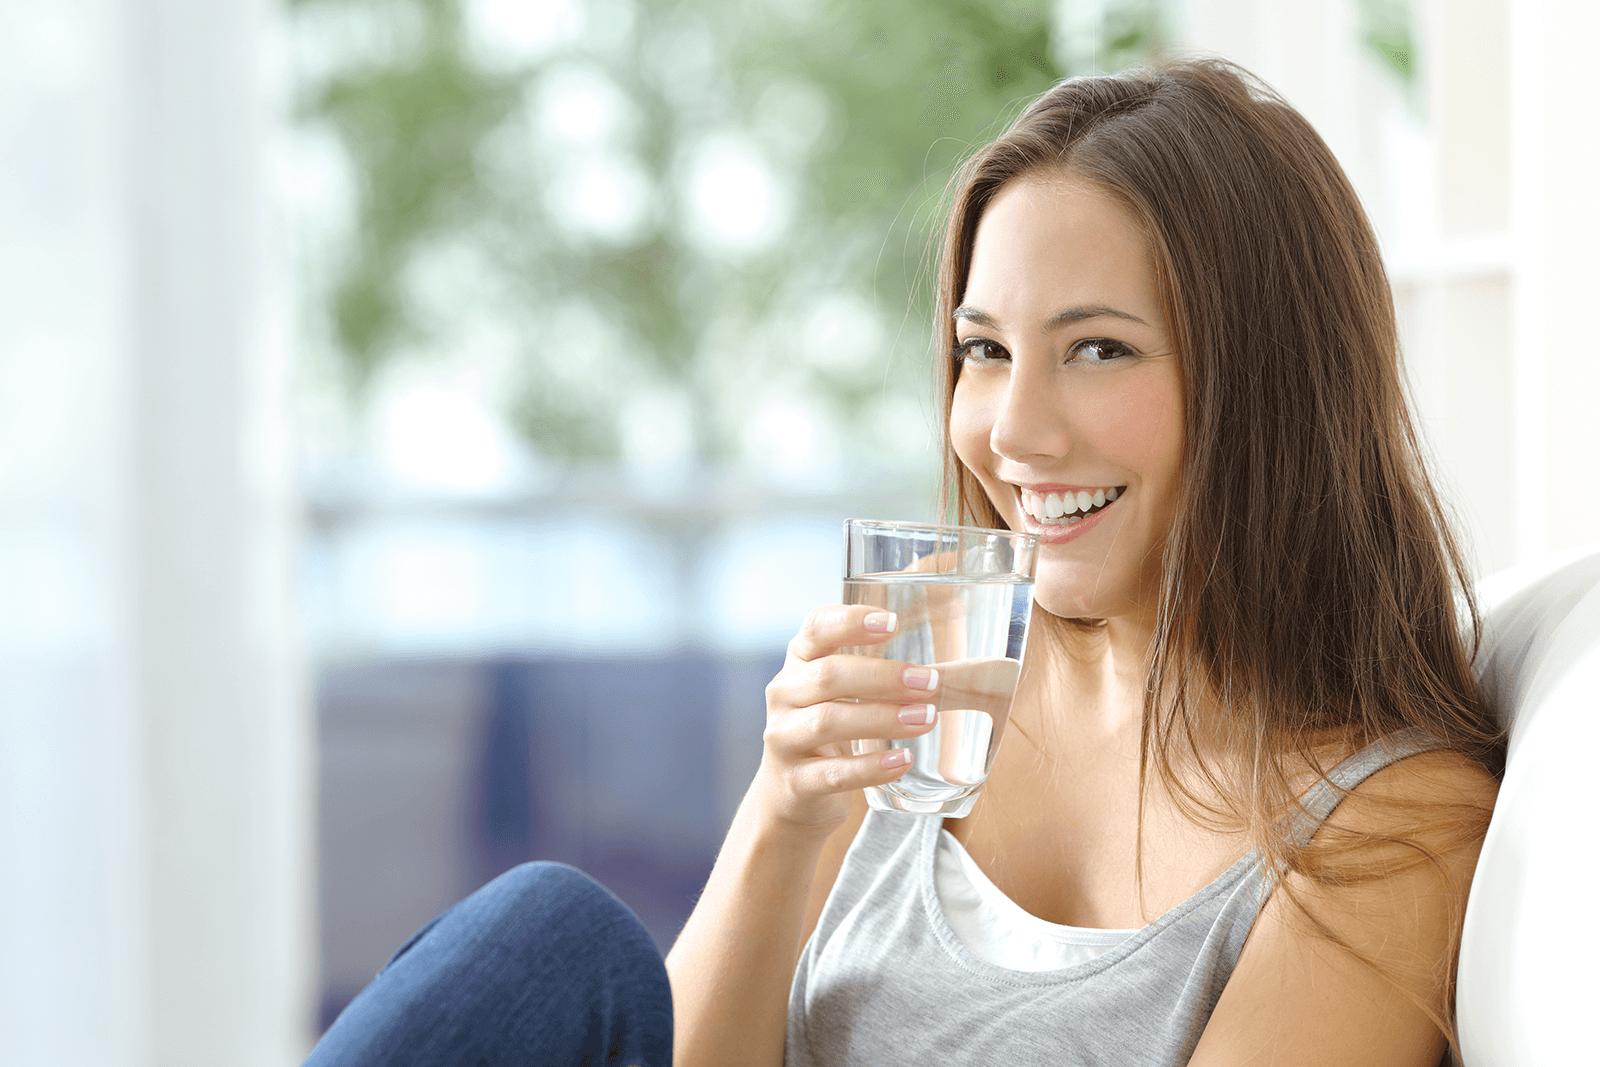 women-brow-glass